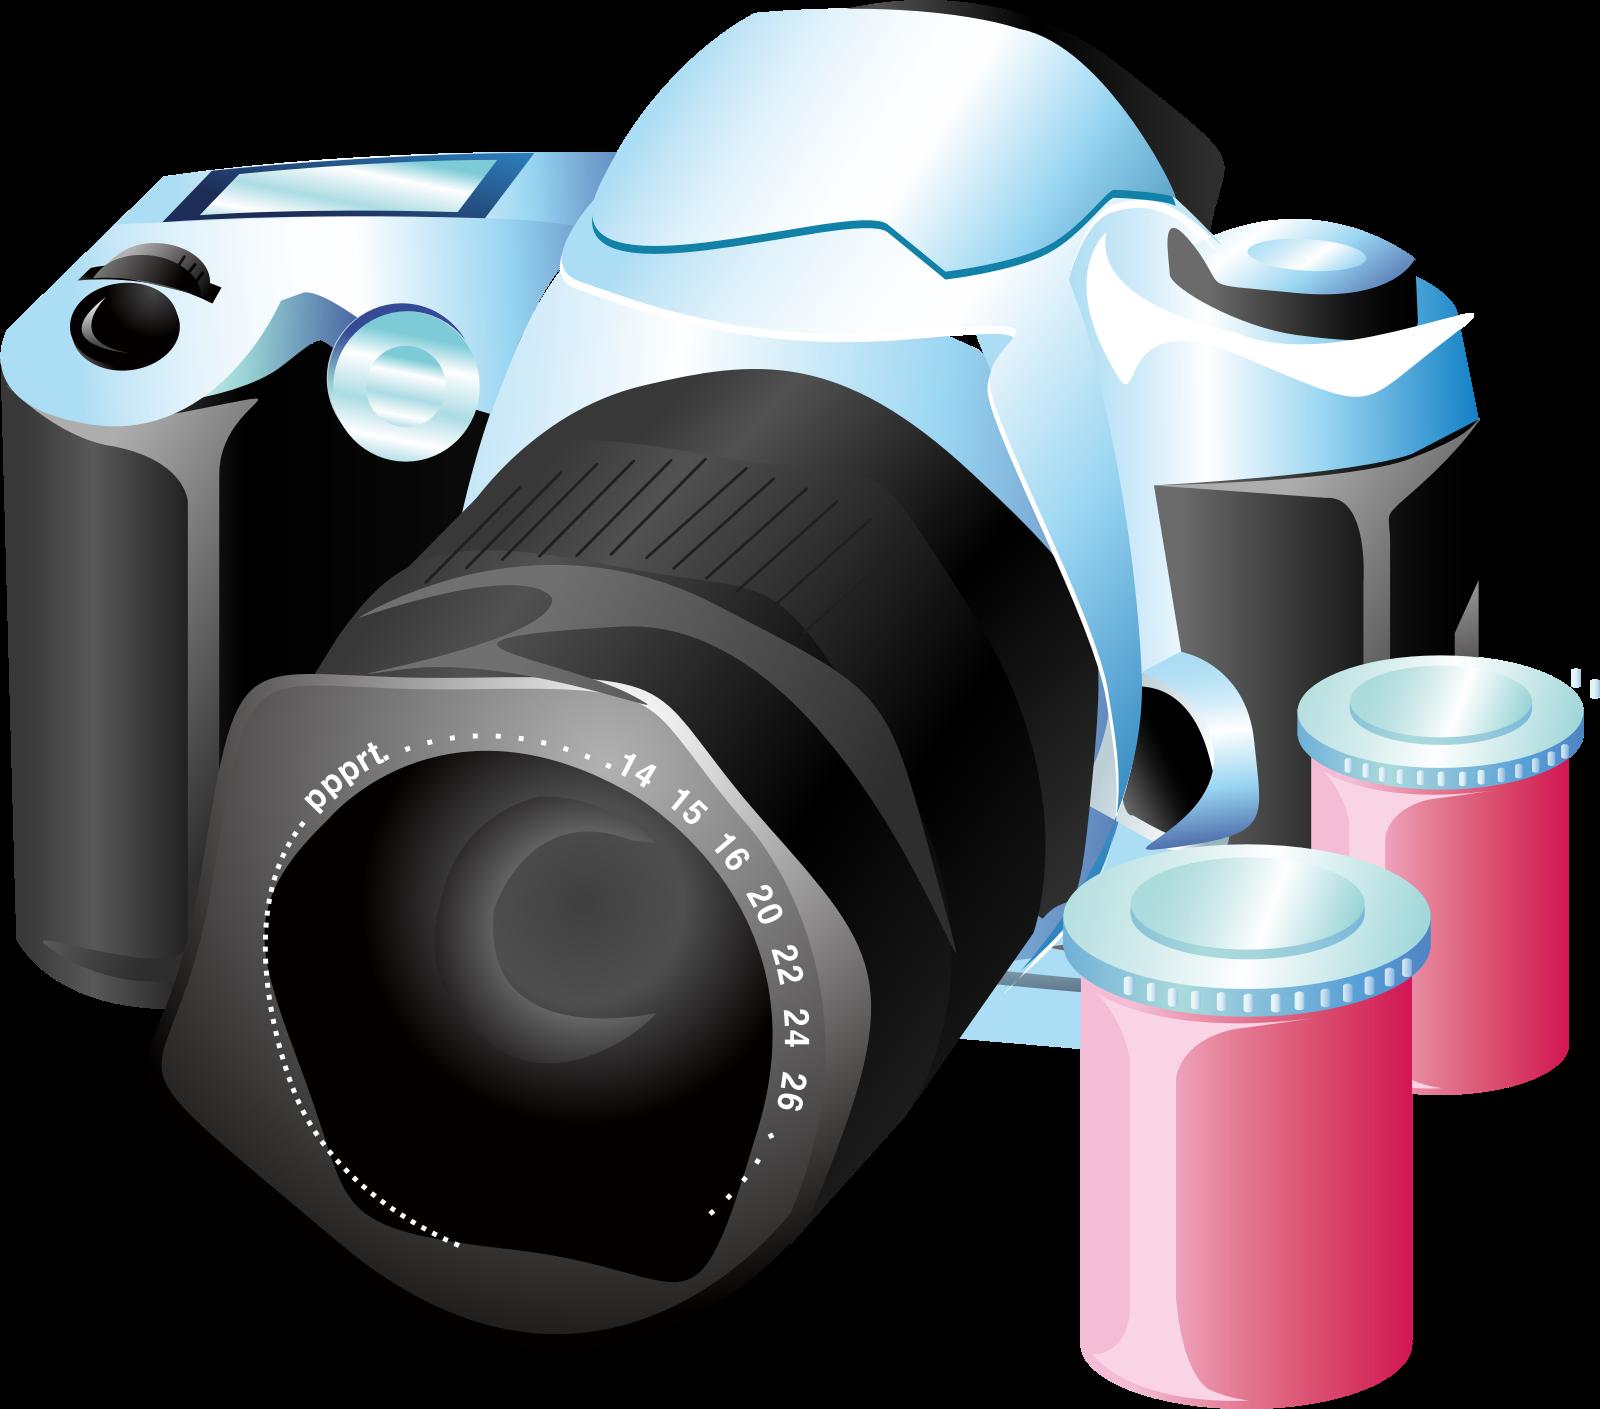 camera clipart professional camera